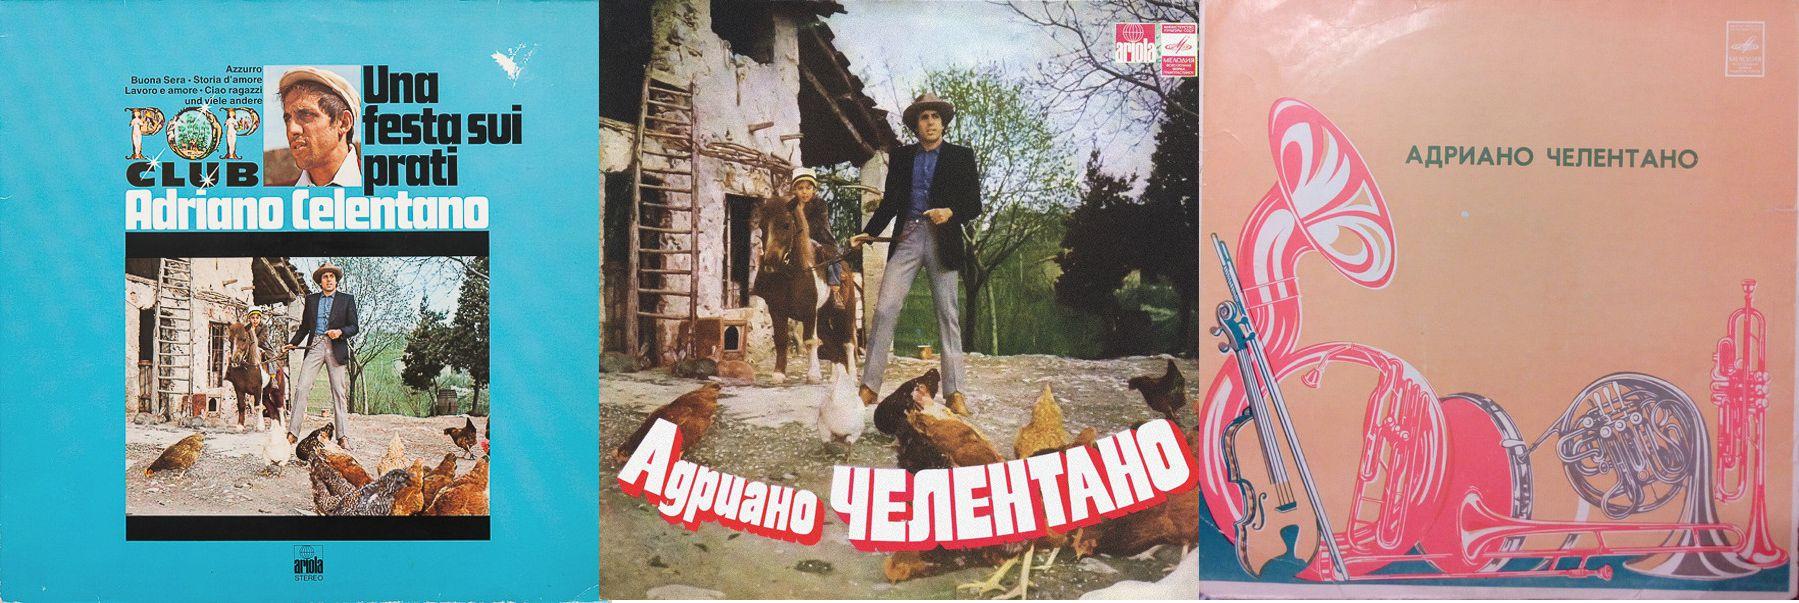 Adriano Celentano – Una Festa Sui Prati Адриано Челентано.jpg